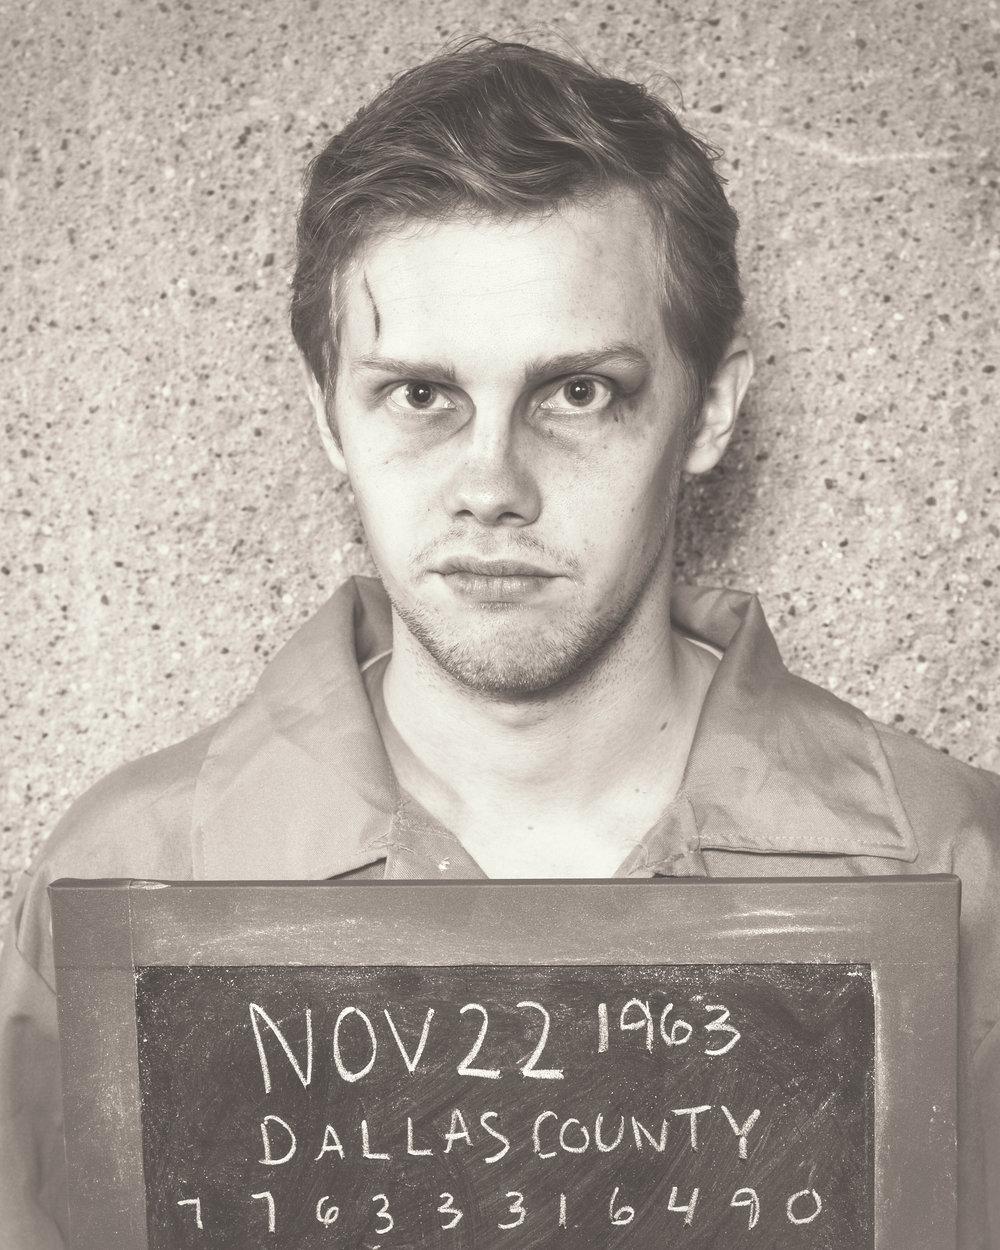 Tyler Michaels as the Baladeer/Lee Harvey Oswald, Photo by Allen Weeks